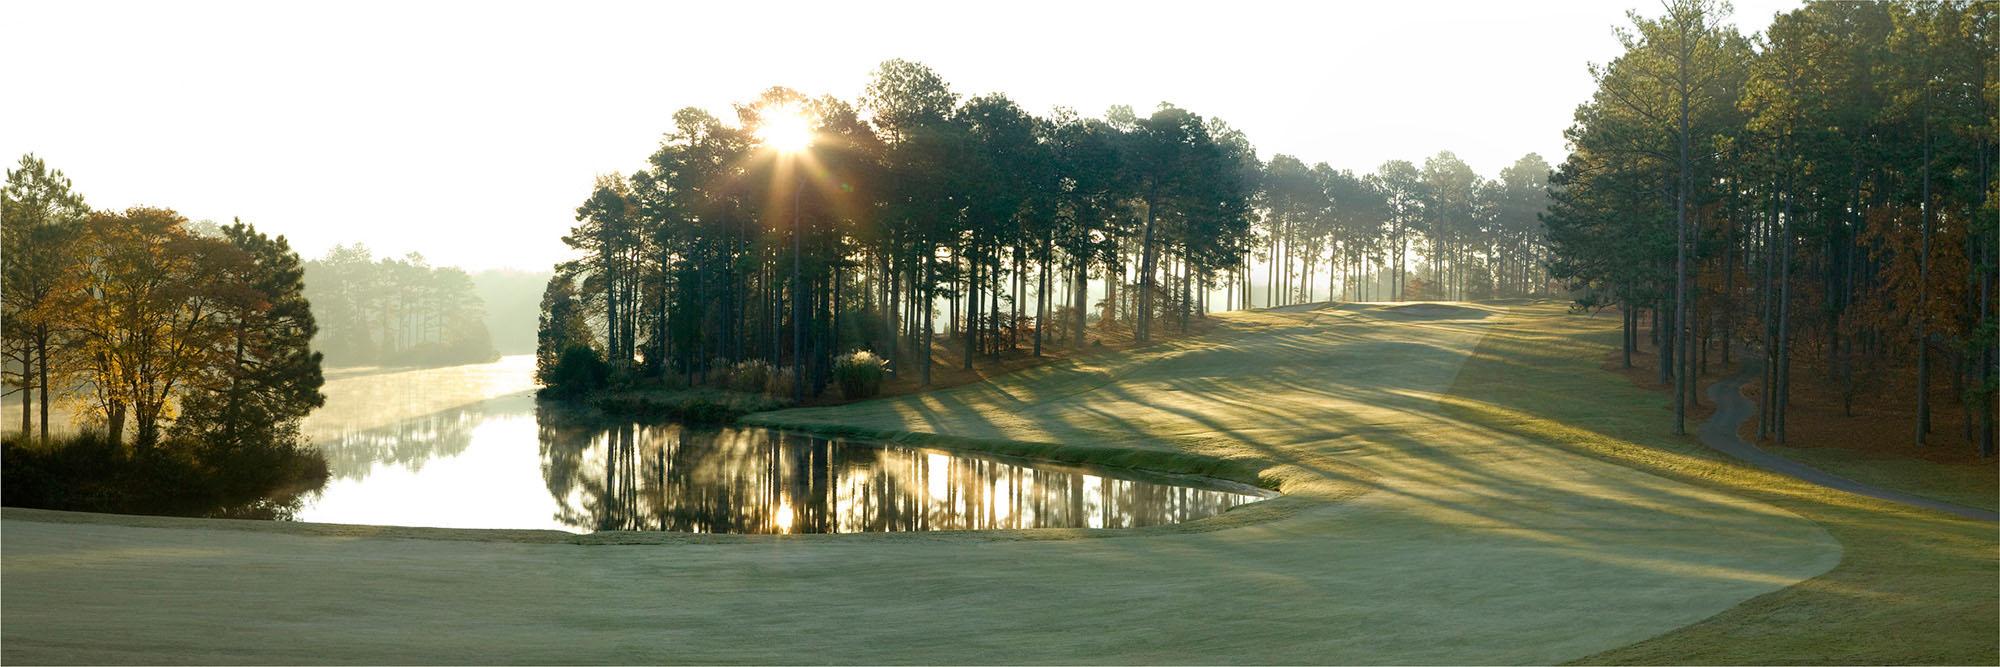 Golf Course Image - Country Club of North Carolina Dogwood No. 18